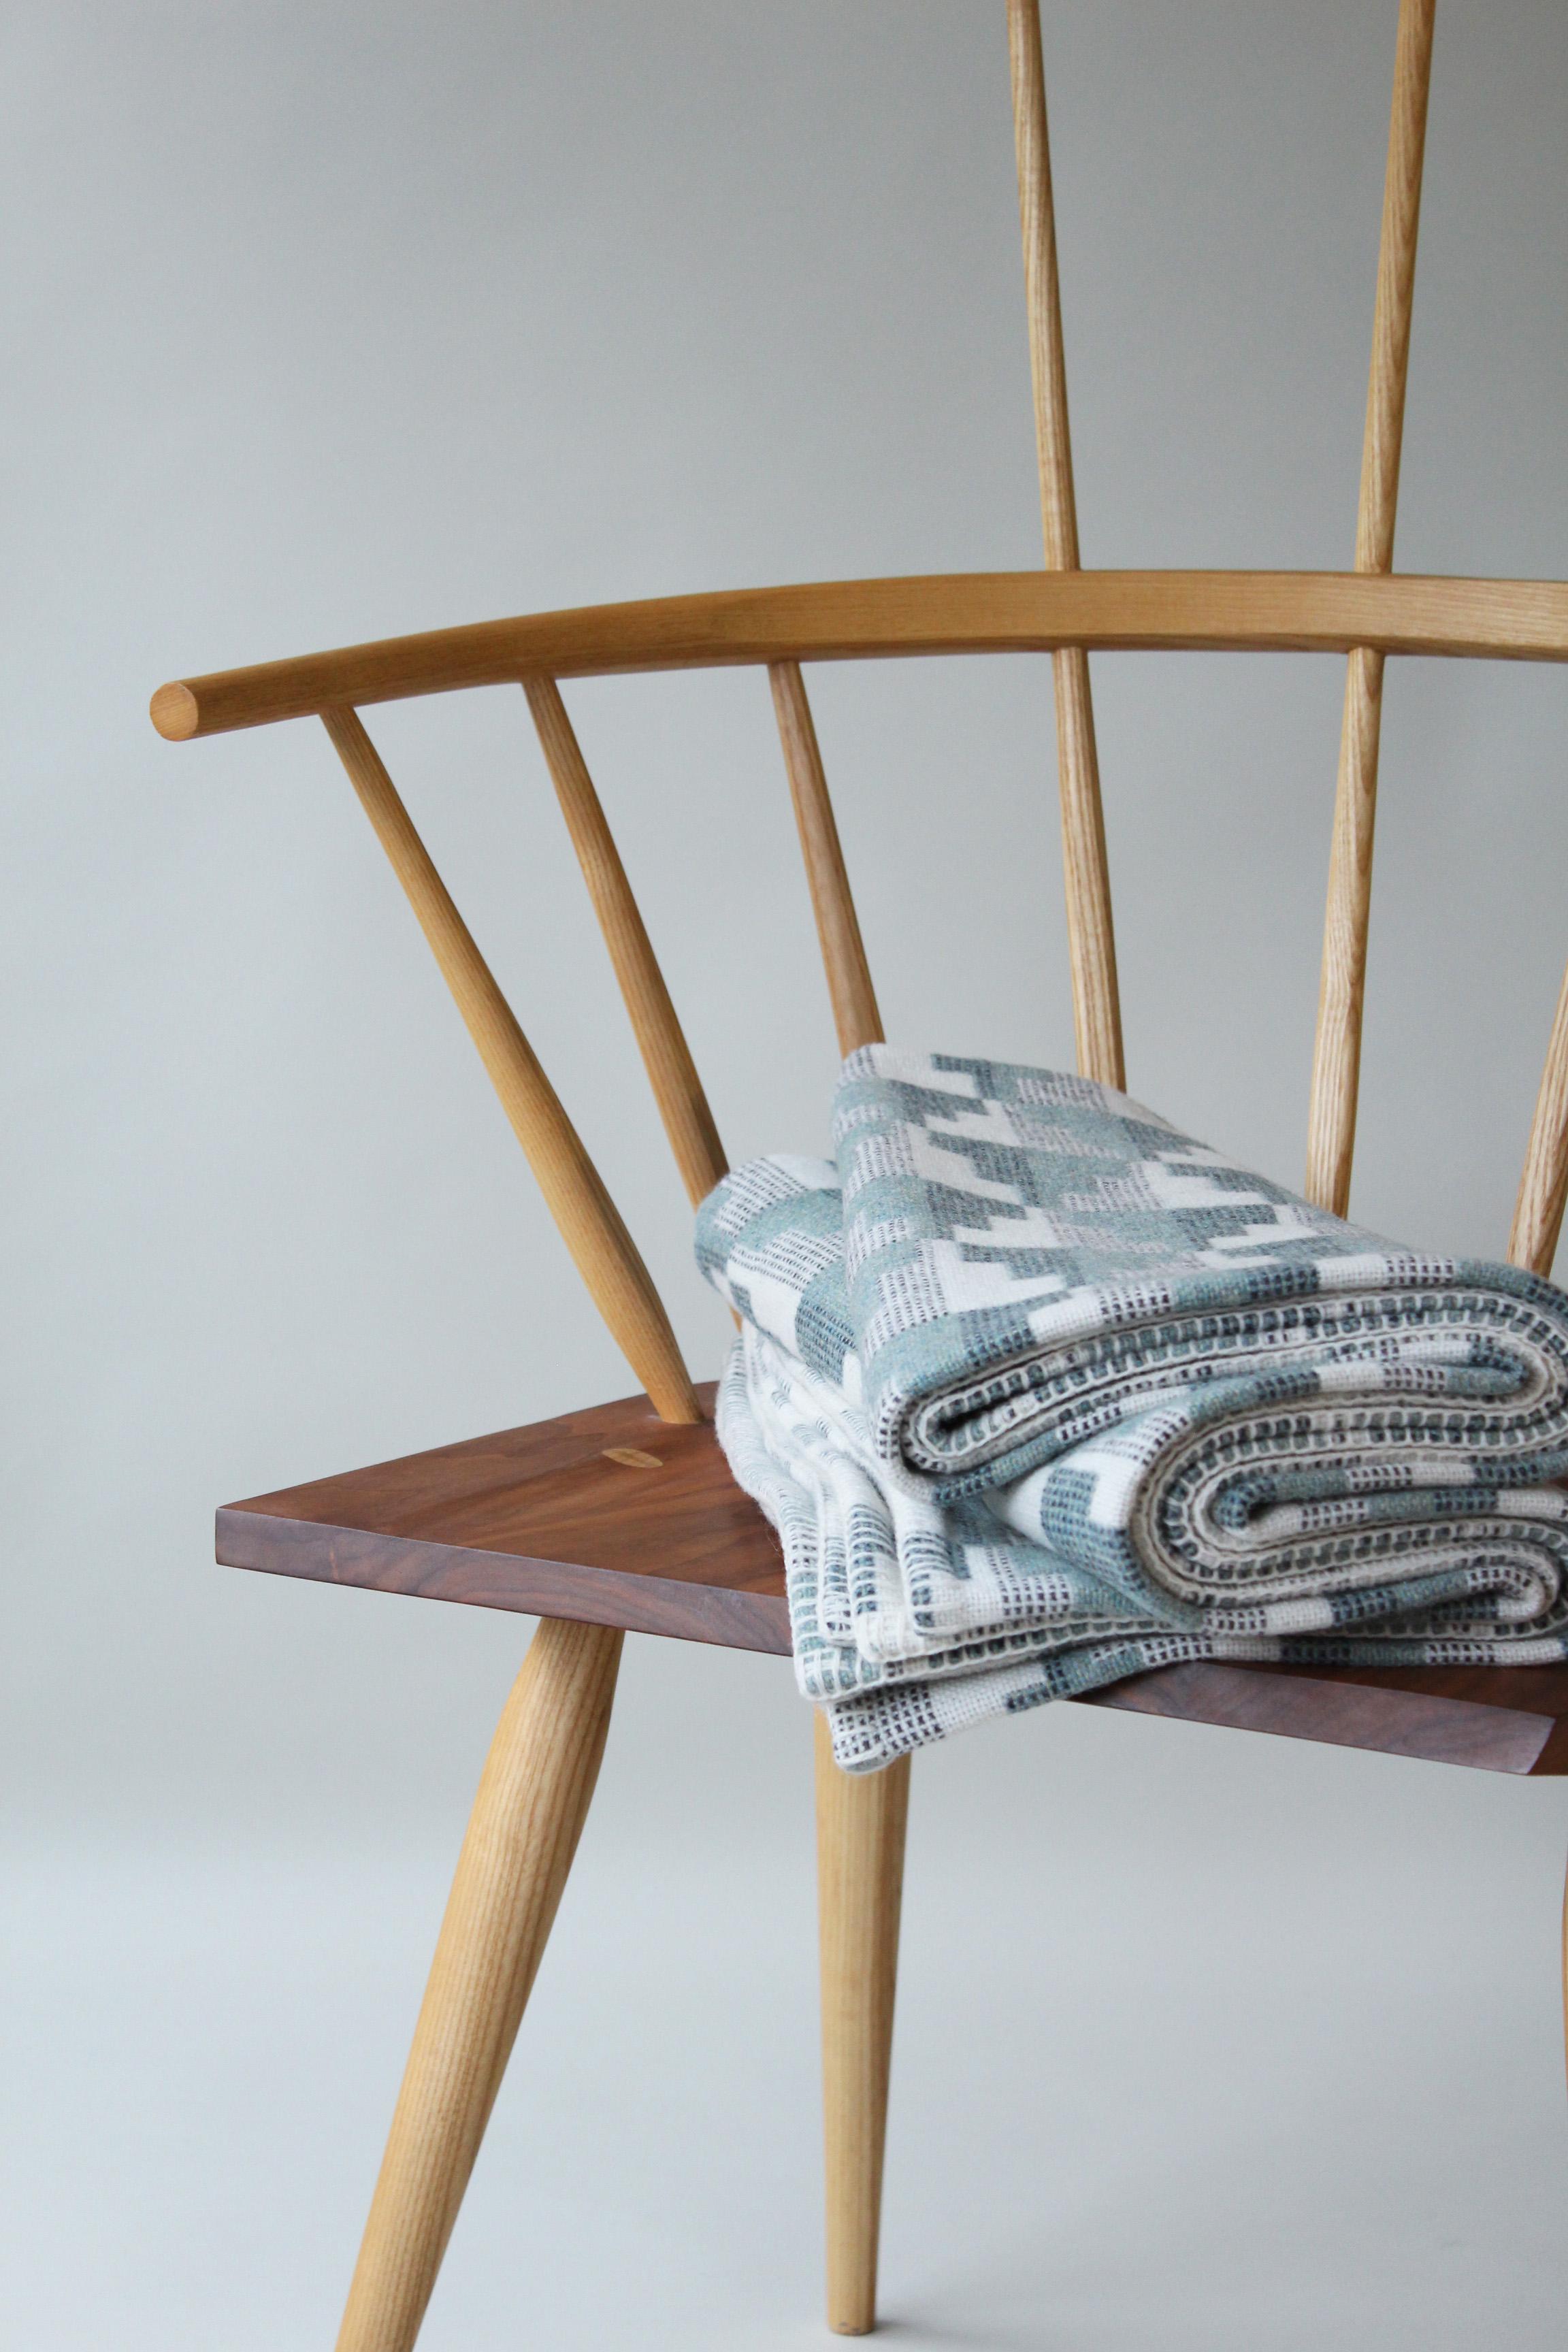 Eleanor_Pritchard_Northerly_Blanket_on_Kimble_Chair_by_Matthew_HIlton_for_De_la_Espada_.jpg